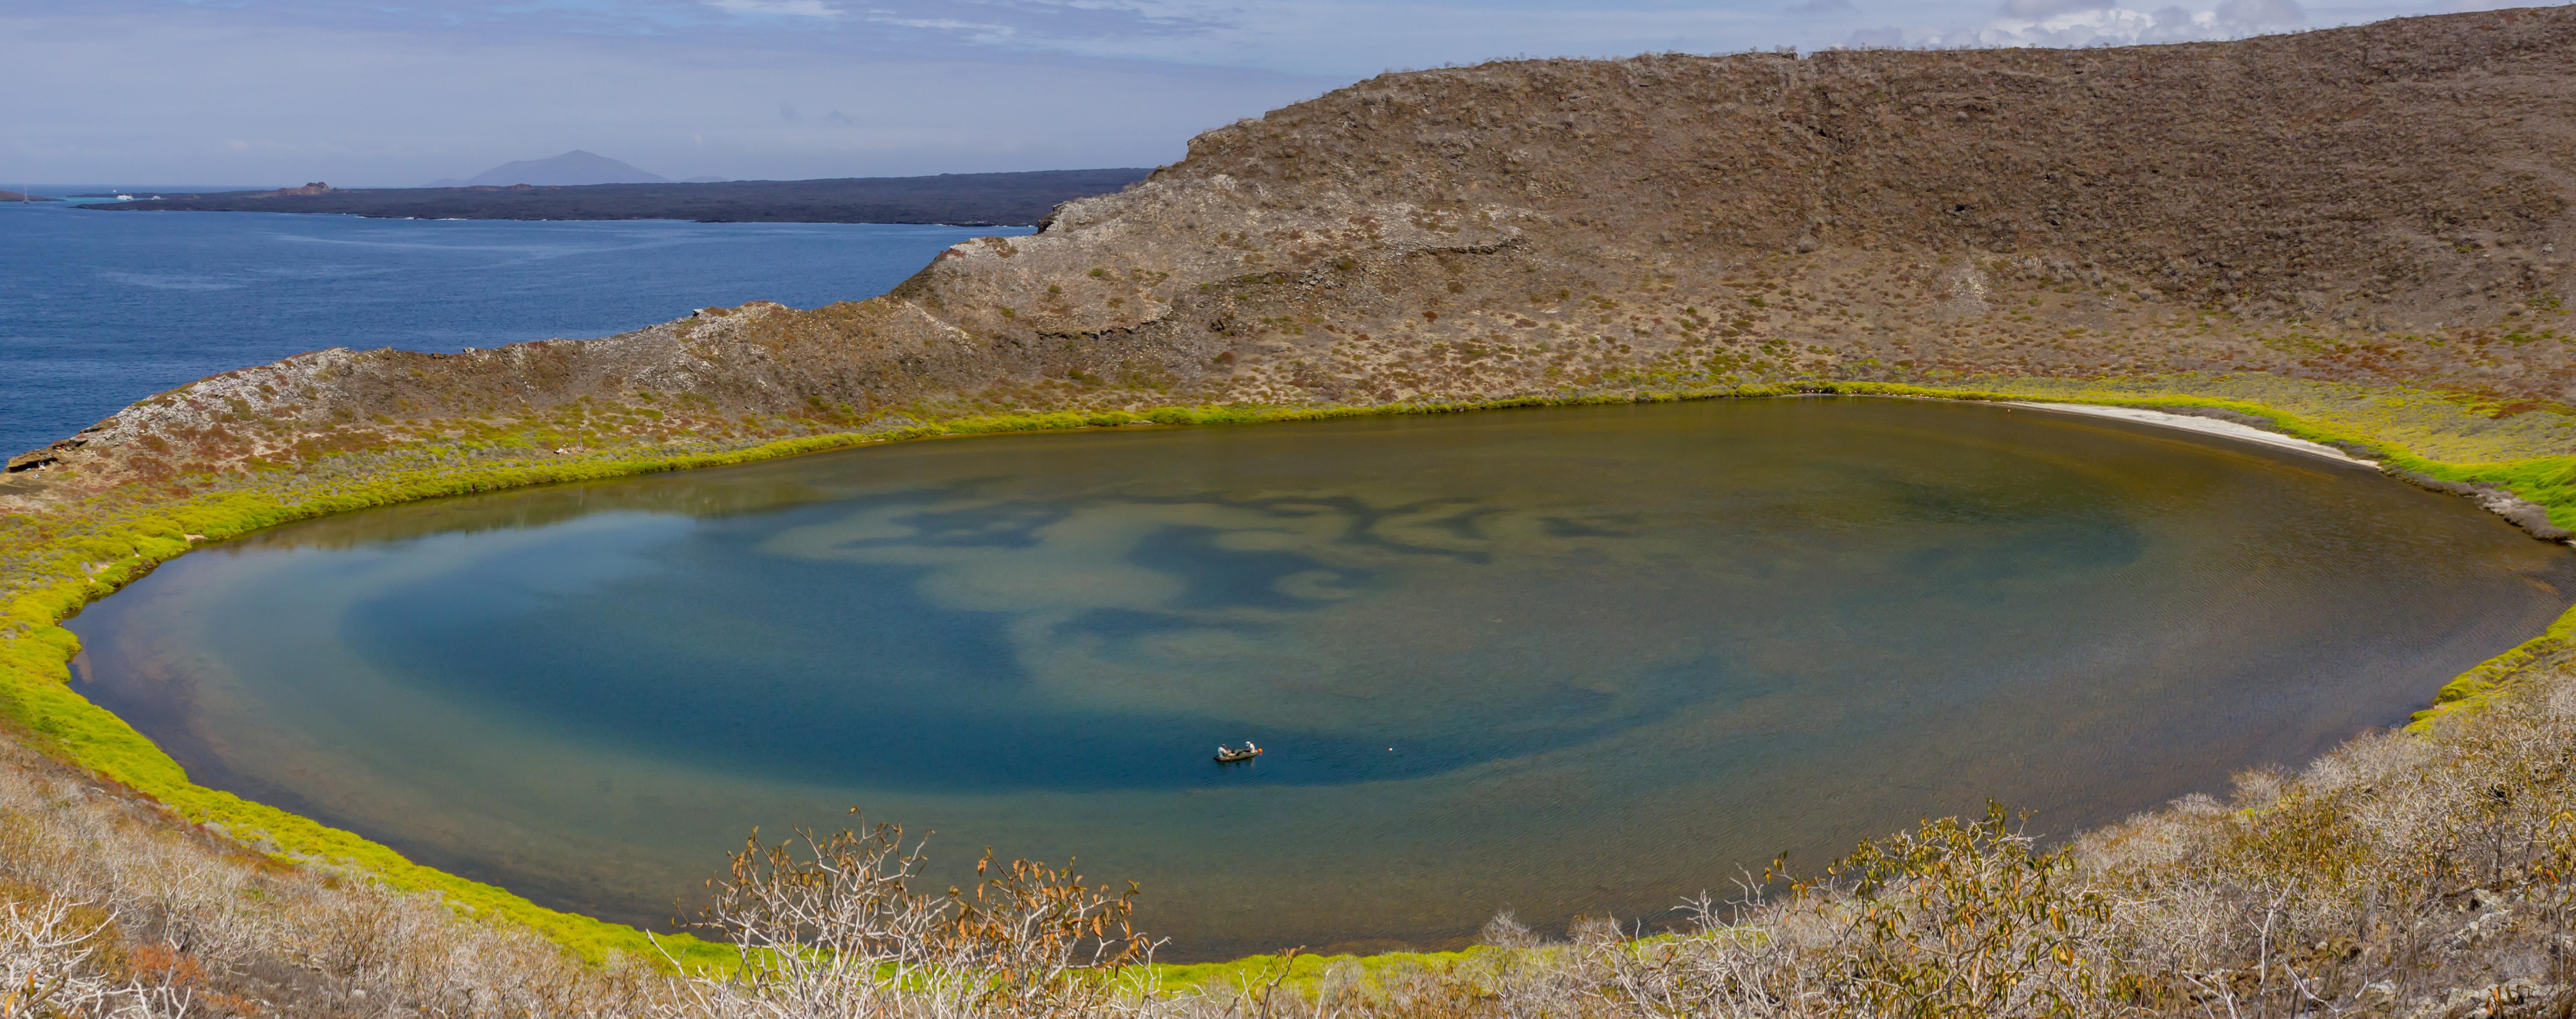 Galapagos Lake Reconstructions (photo credit: Stephan Hlohowskyj)